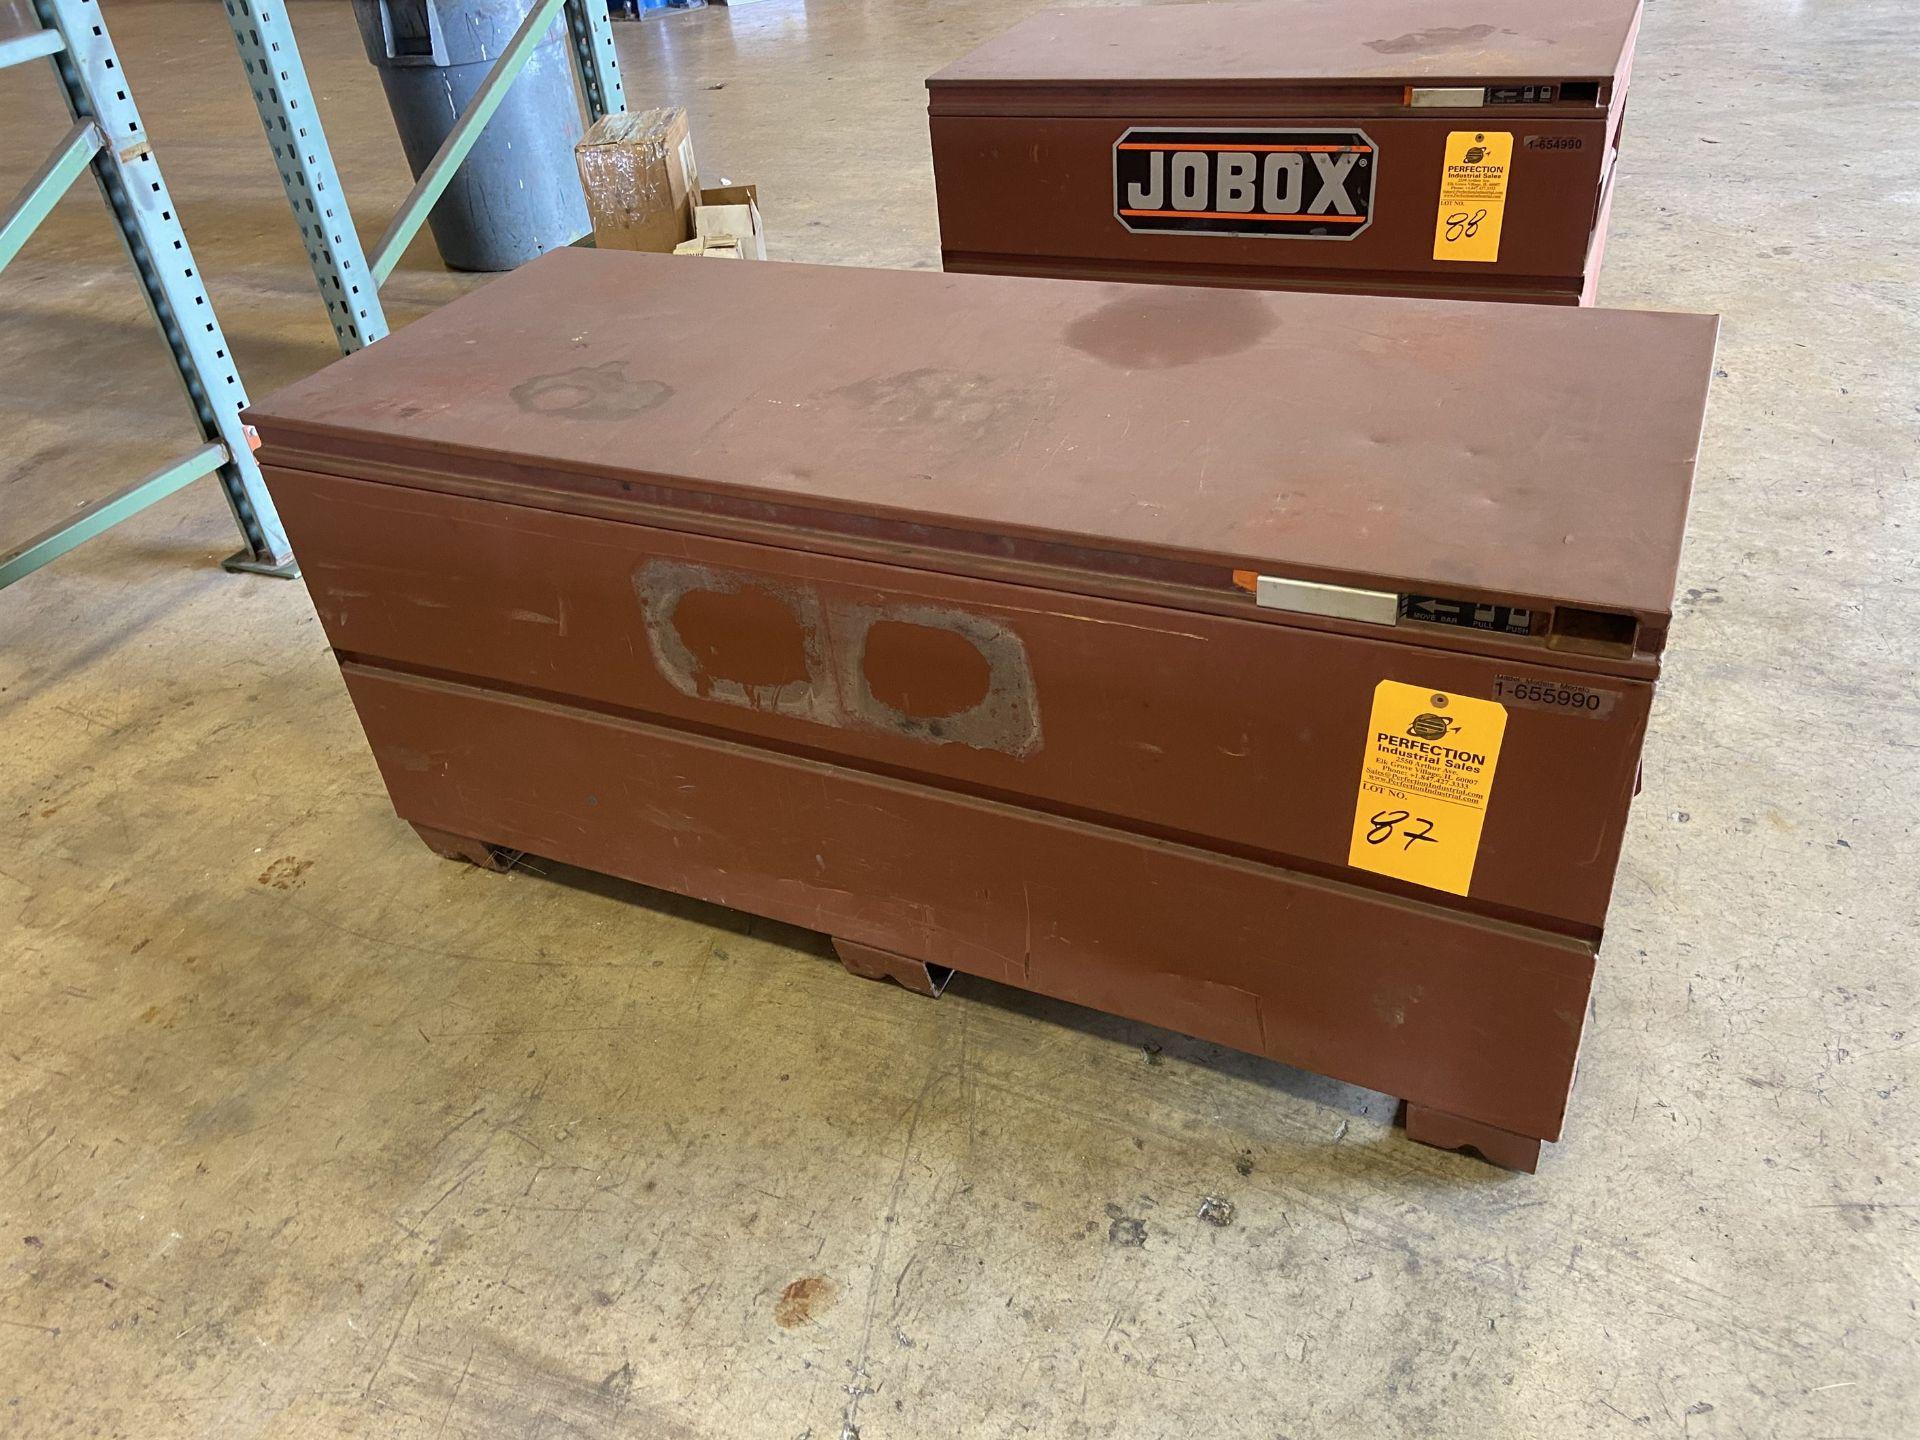 Jobox Model 1-655990